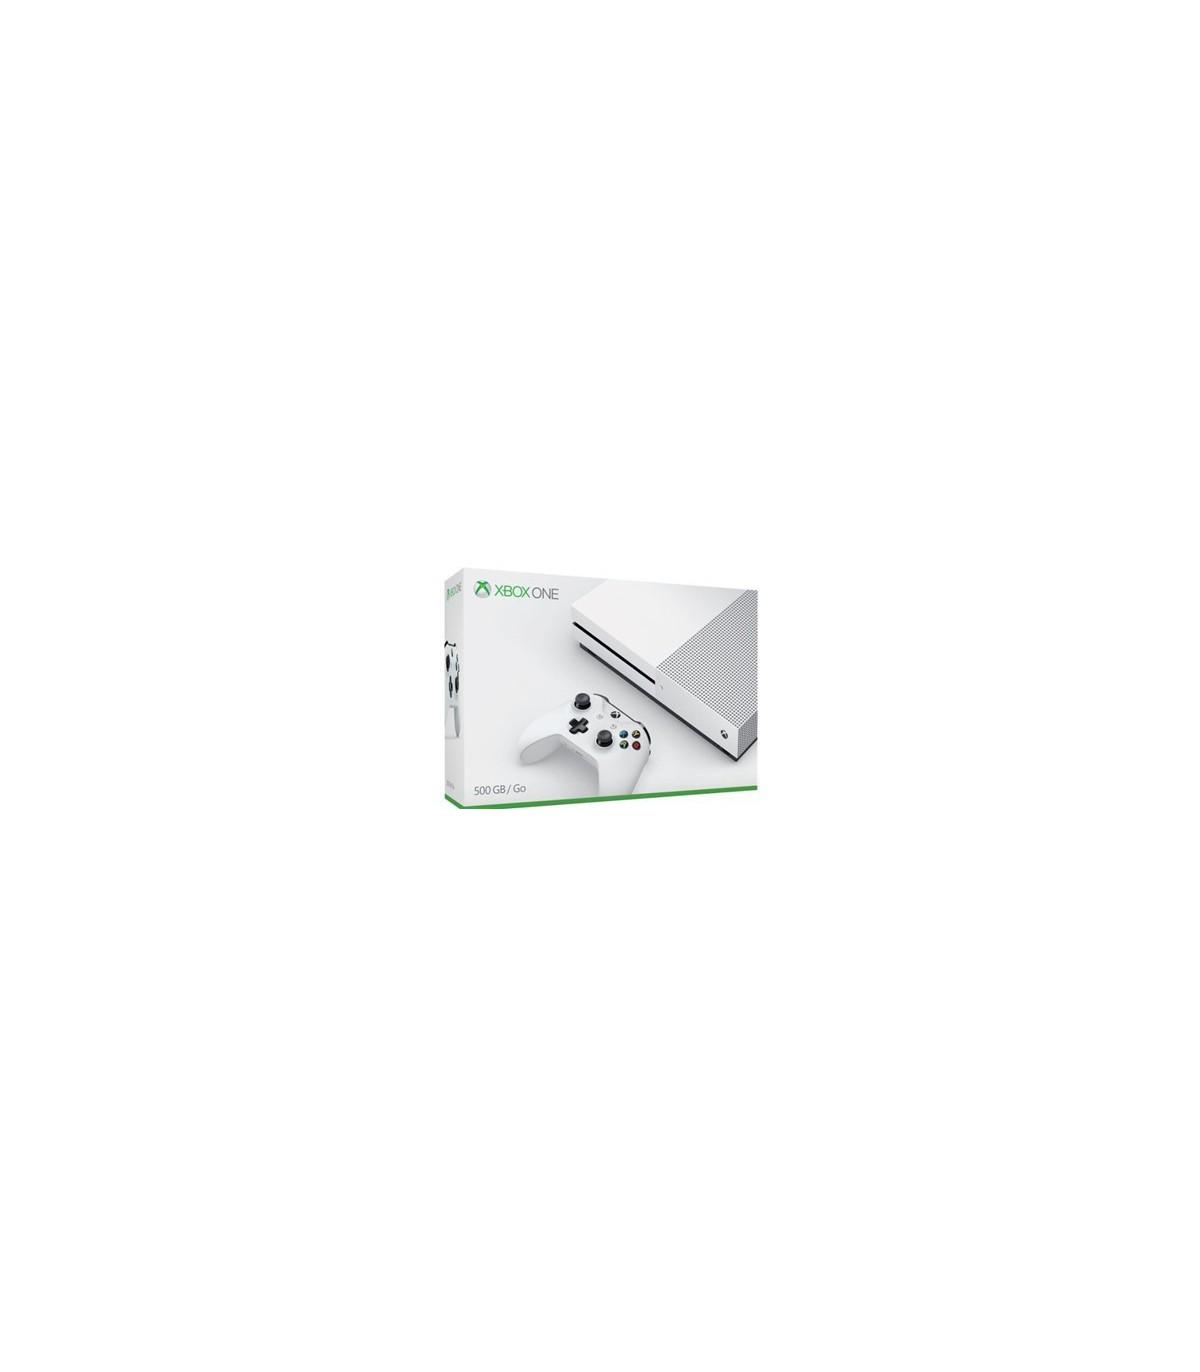 Microsoft Xbox One S - 500GB Game Console